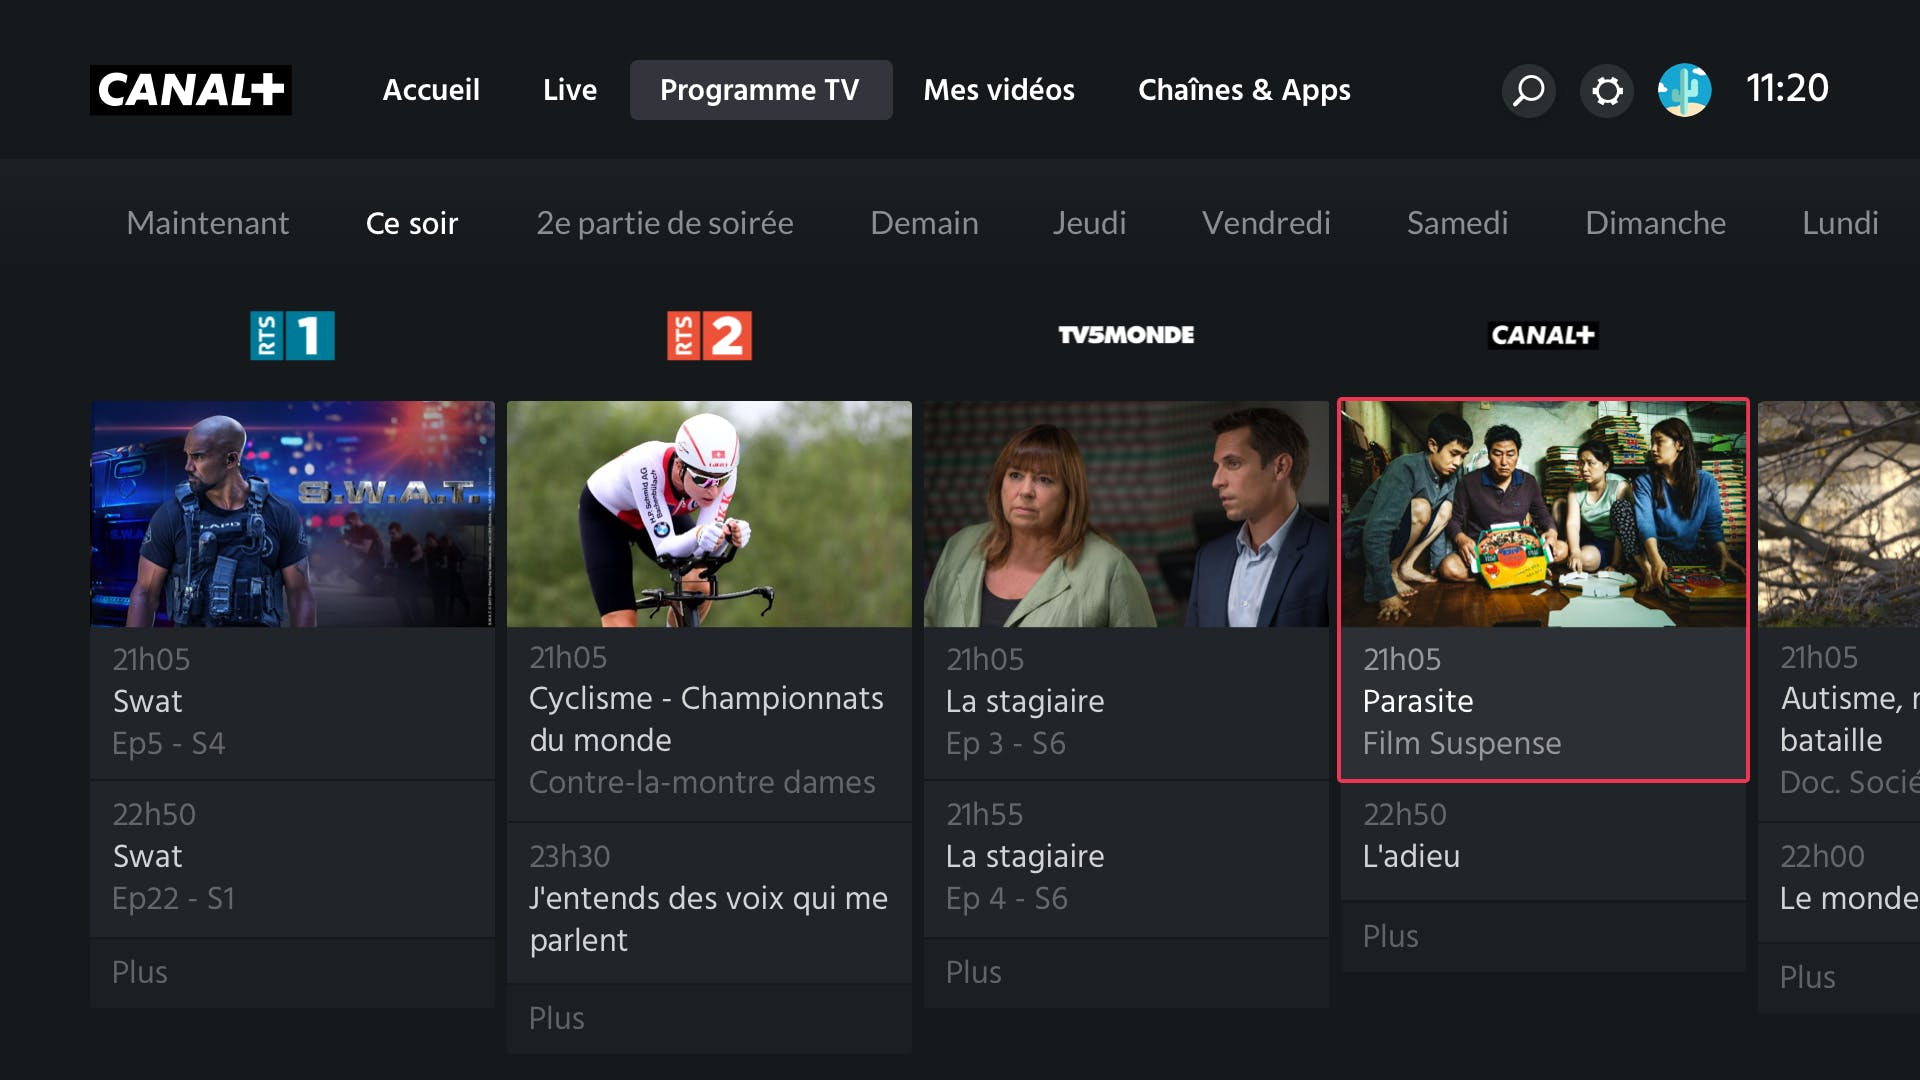 010-PVR Suisse - Programme TV - Focus CANAL+.png